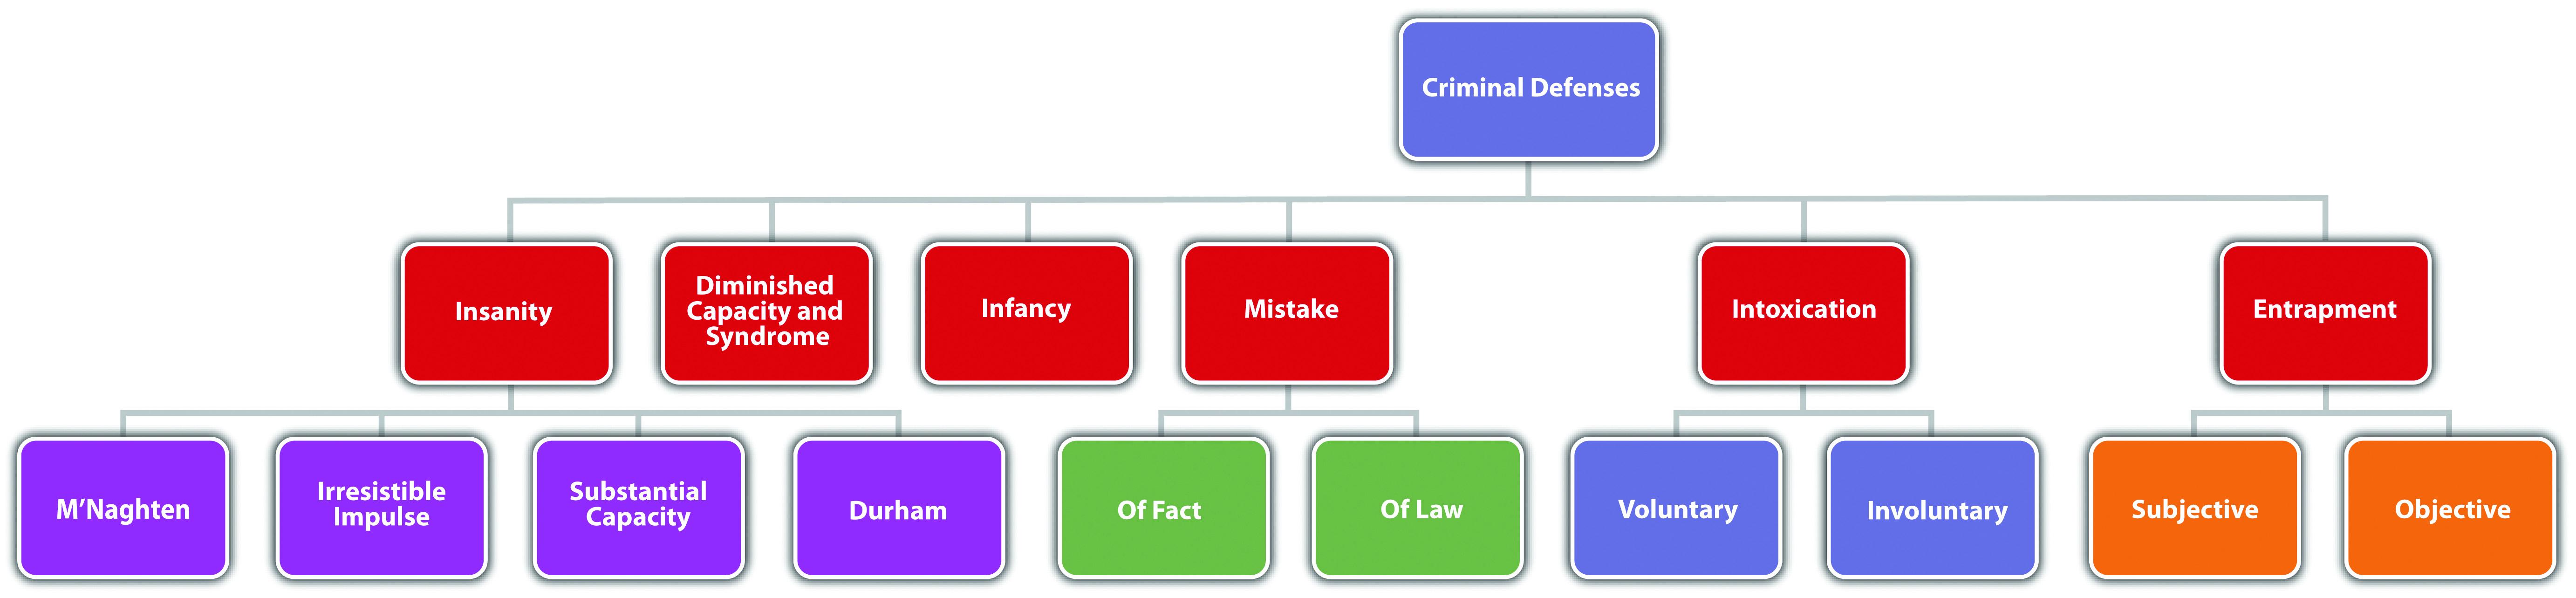 Diagram of Defenses, Part 2